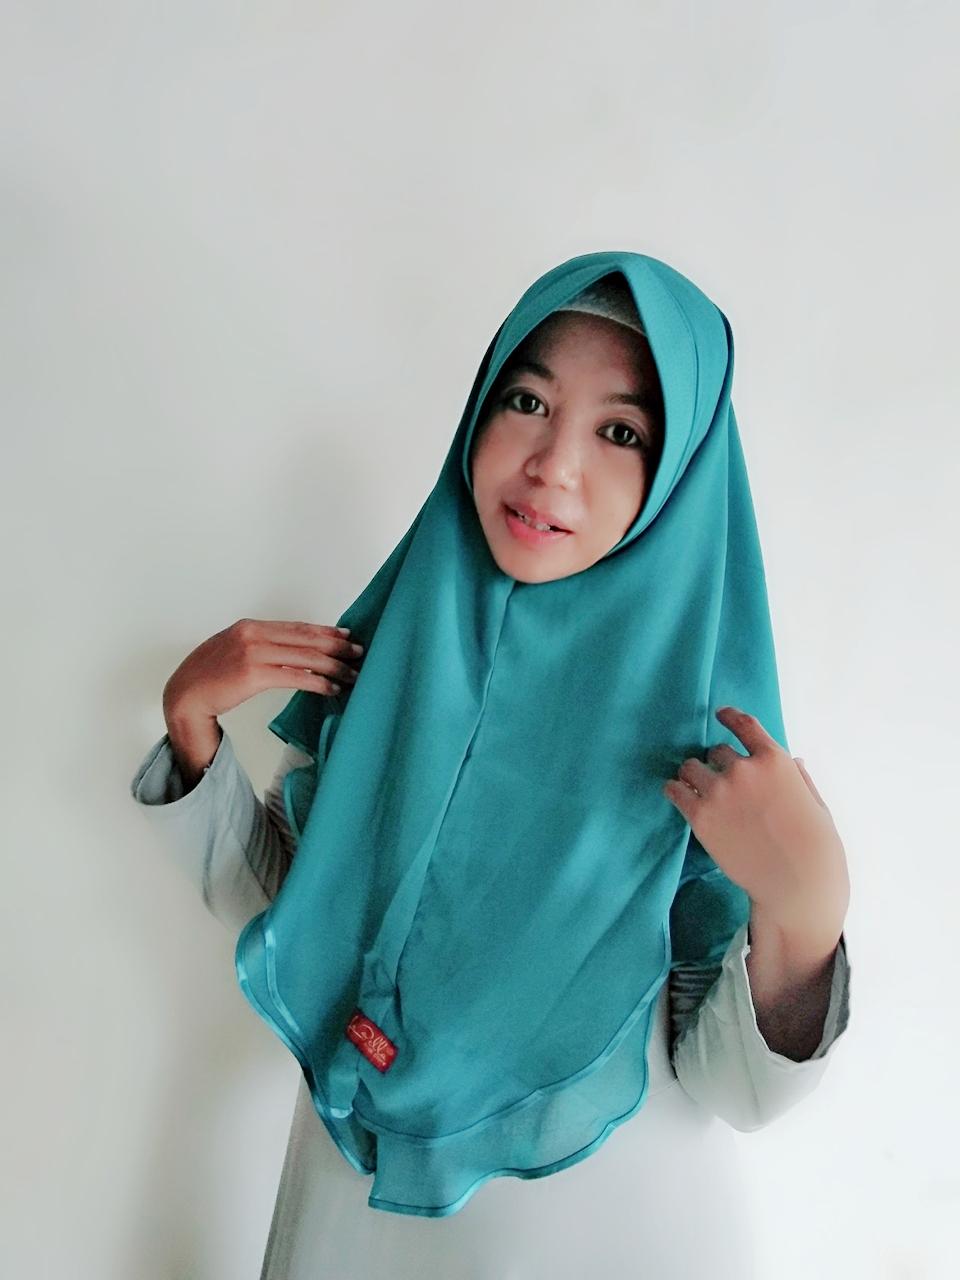 Agen Jilbab Daffi Jual Jilbab Dan Kerudung Model Terbaru